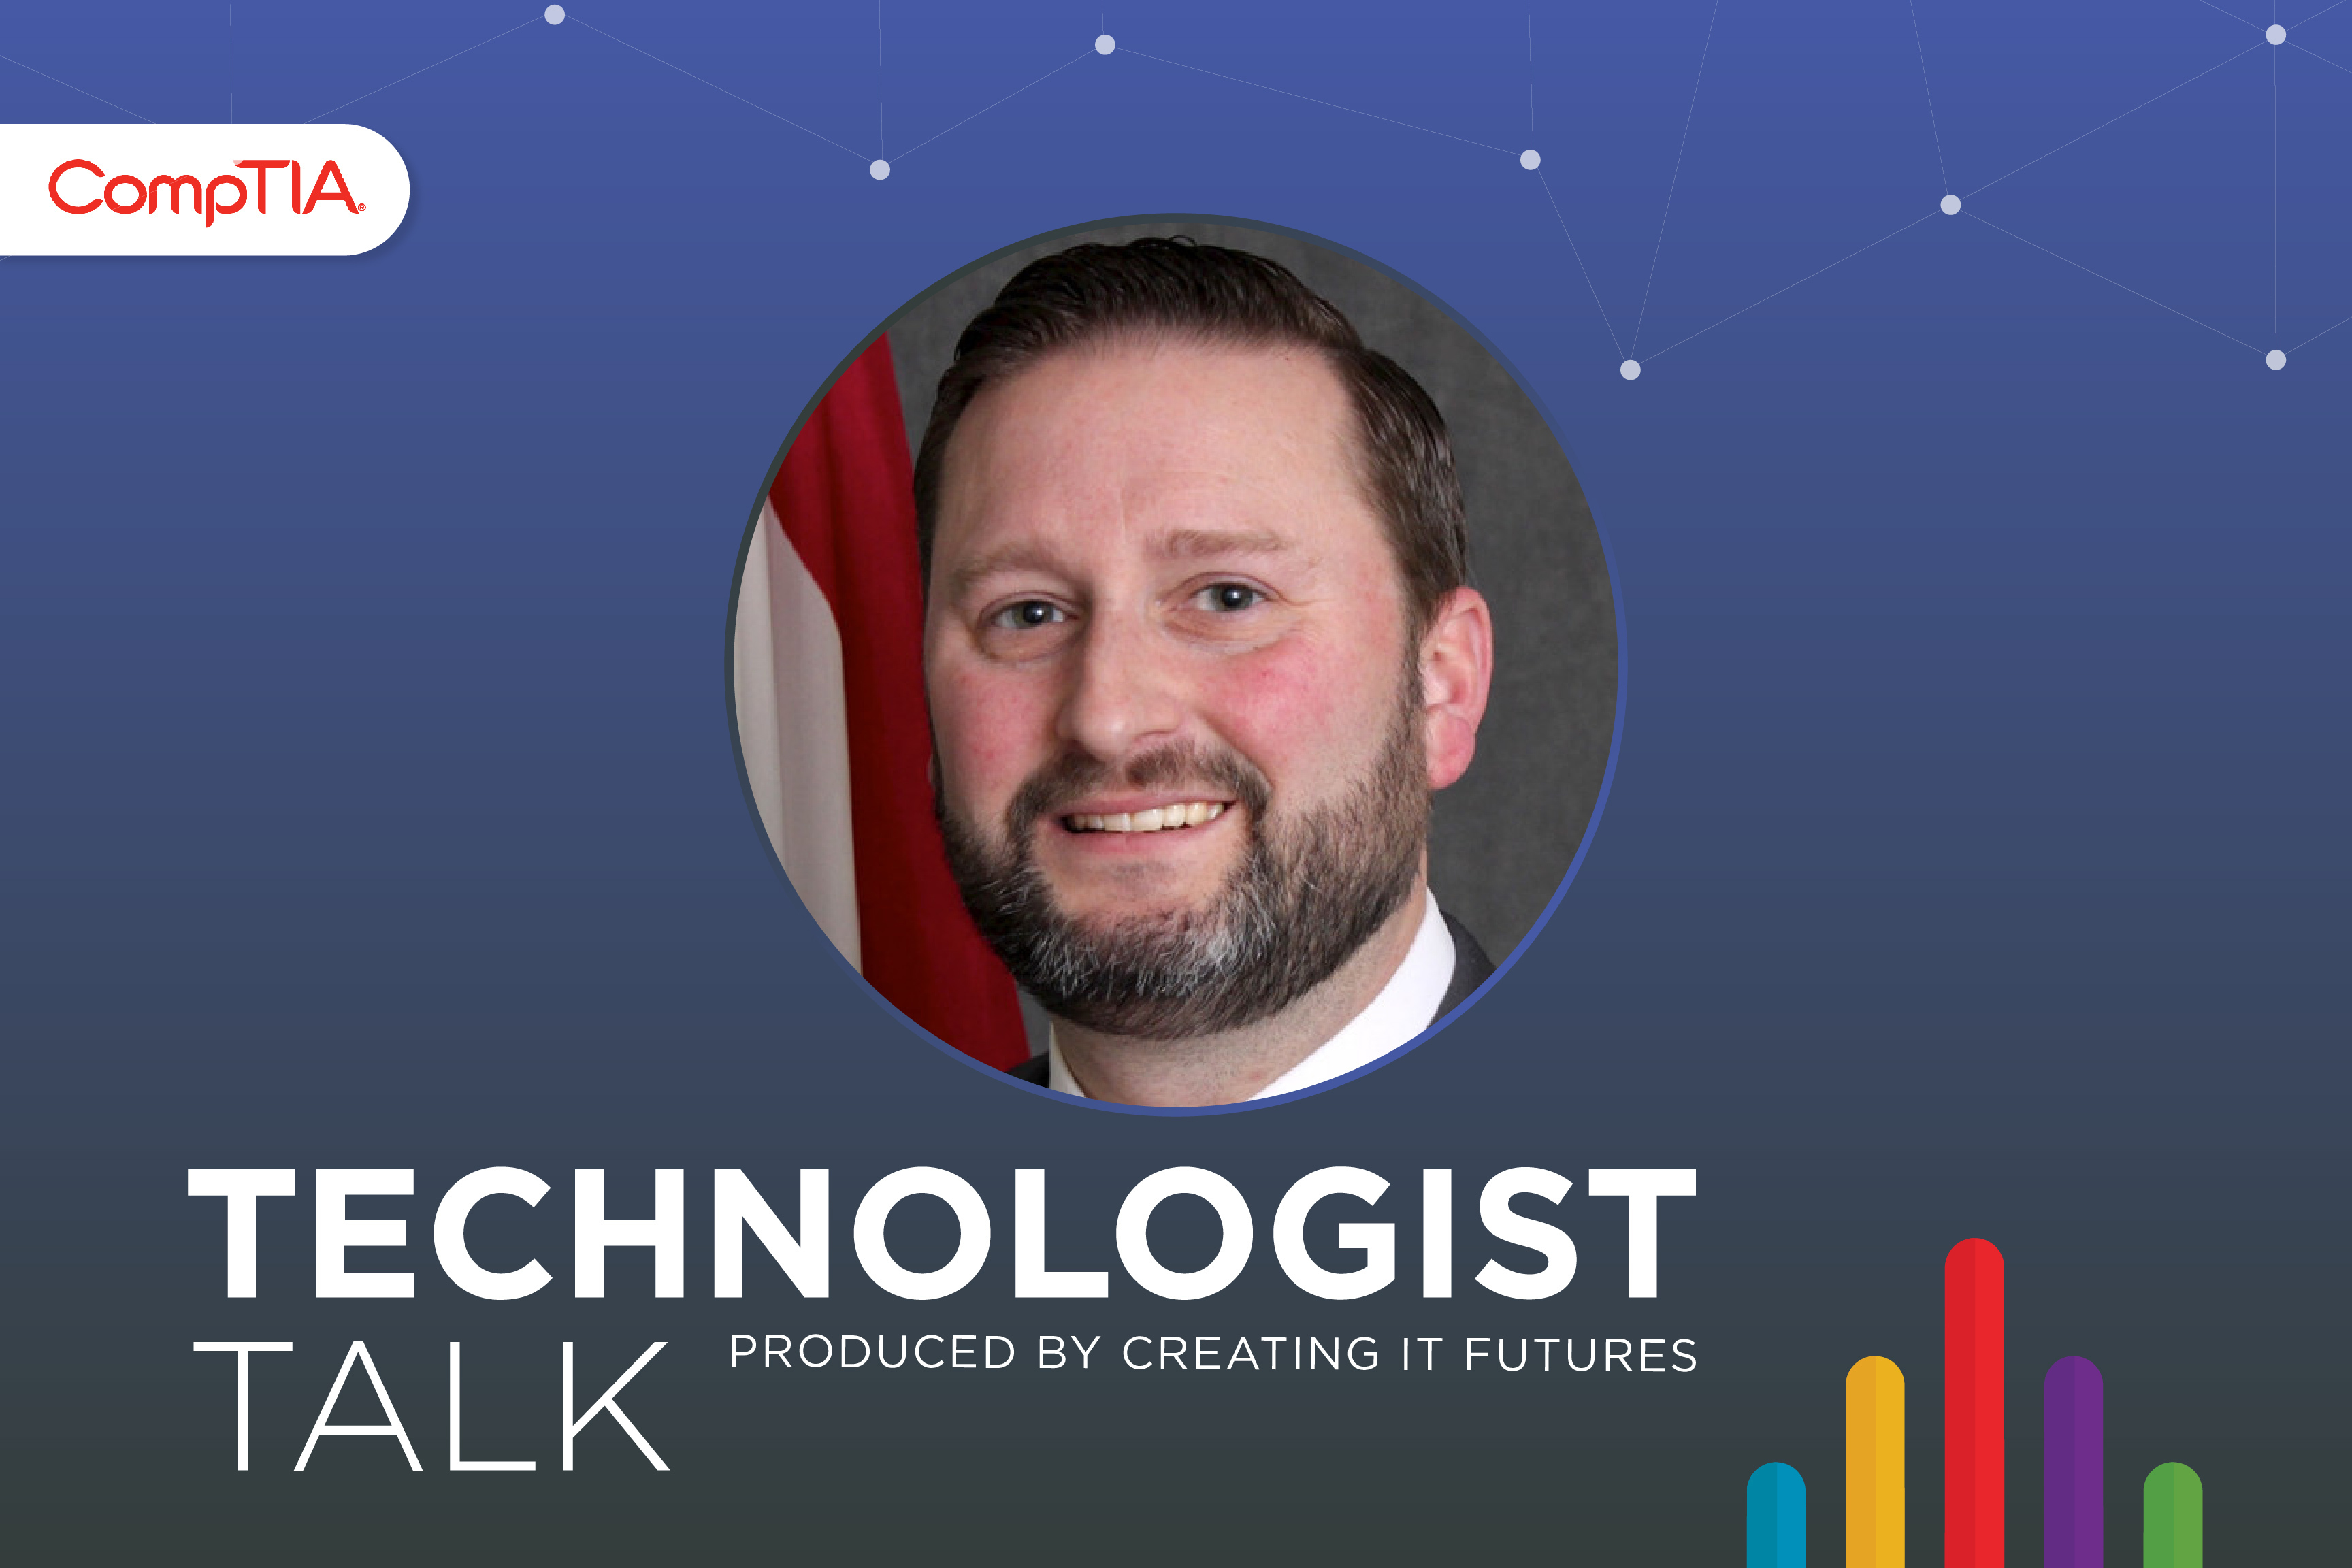 Missouri Technologist Talk